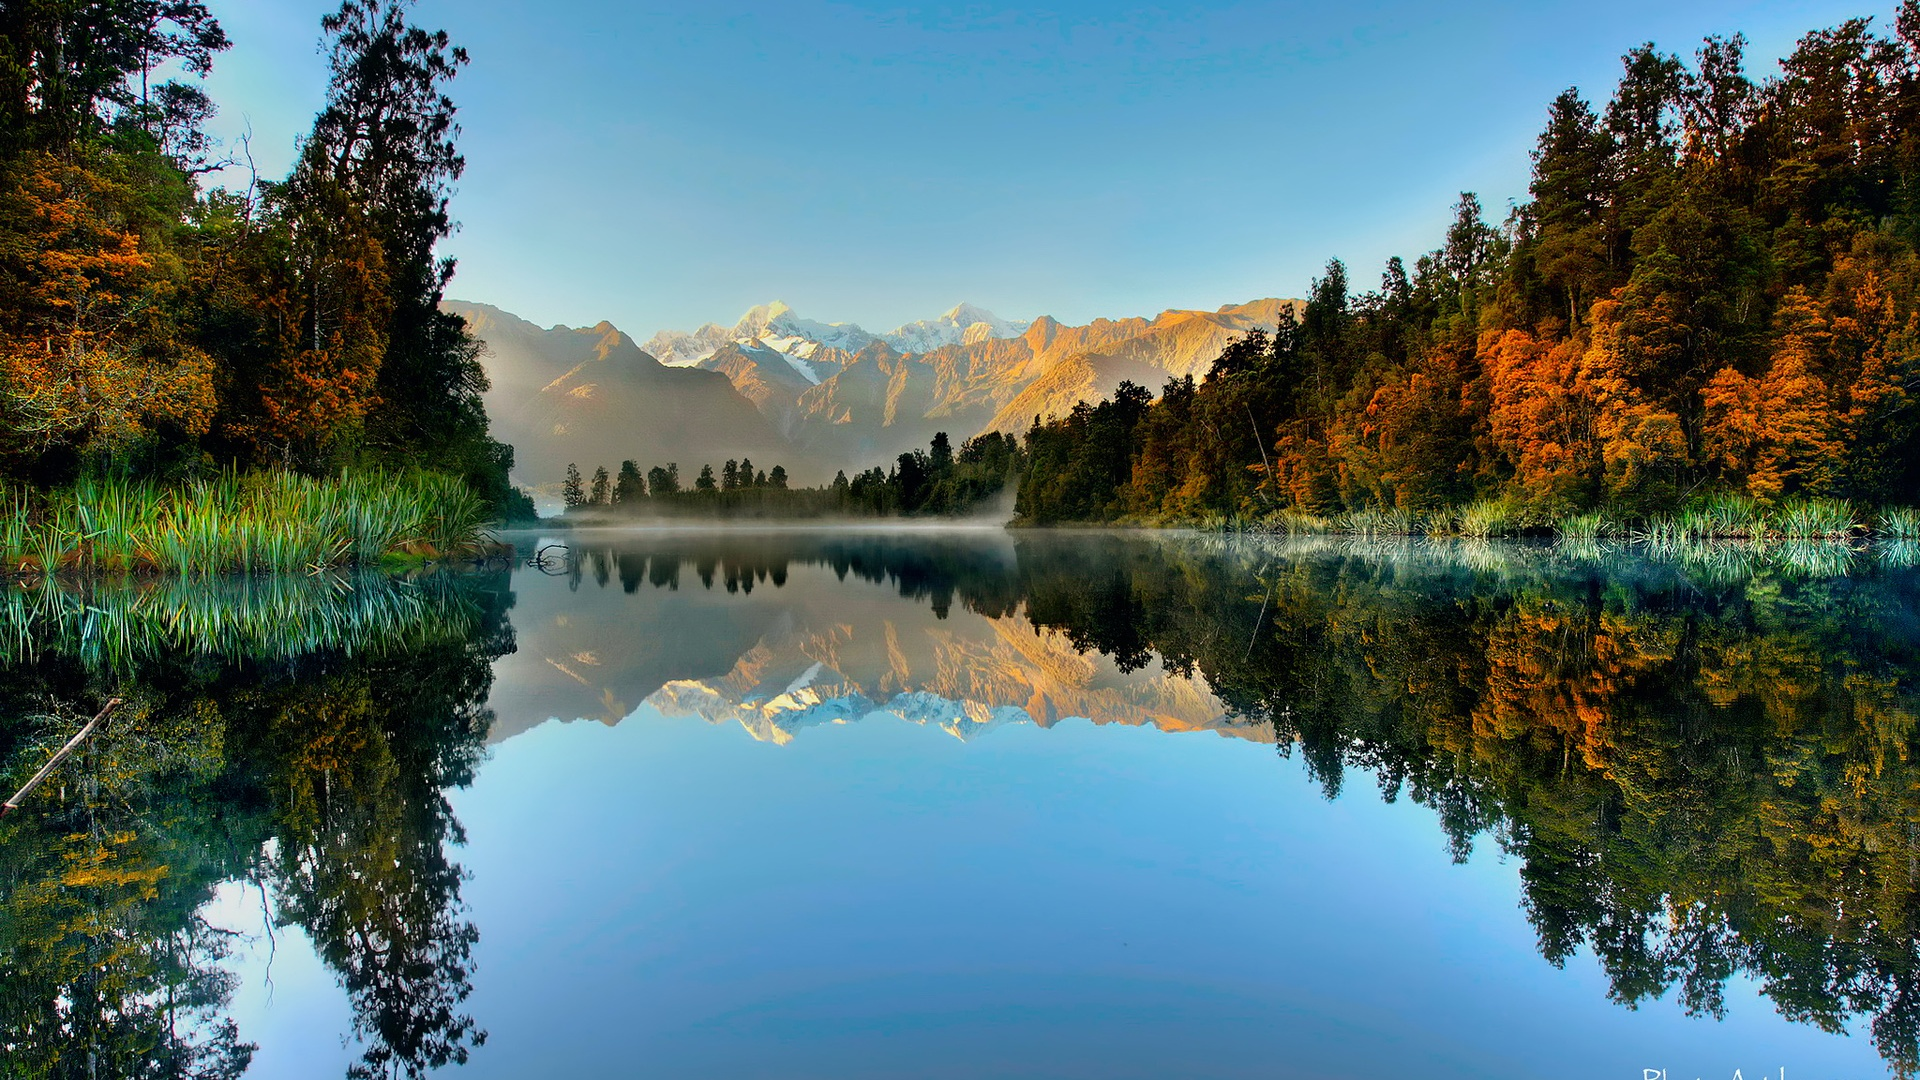 Pelaku Penembakan New Zealand Wallpaper: 壁纸 新西兰西部国家公园,福克斯冰川,湖泊,山脉,森林 1920x1200 HD 高清壁纸, 图片, 照片